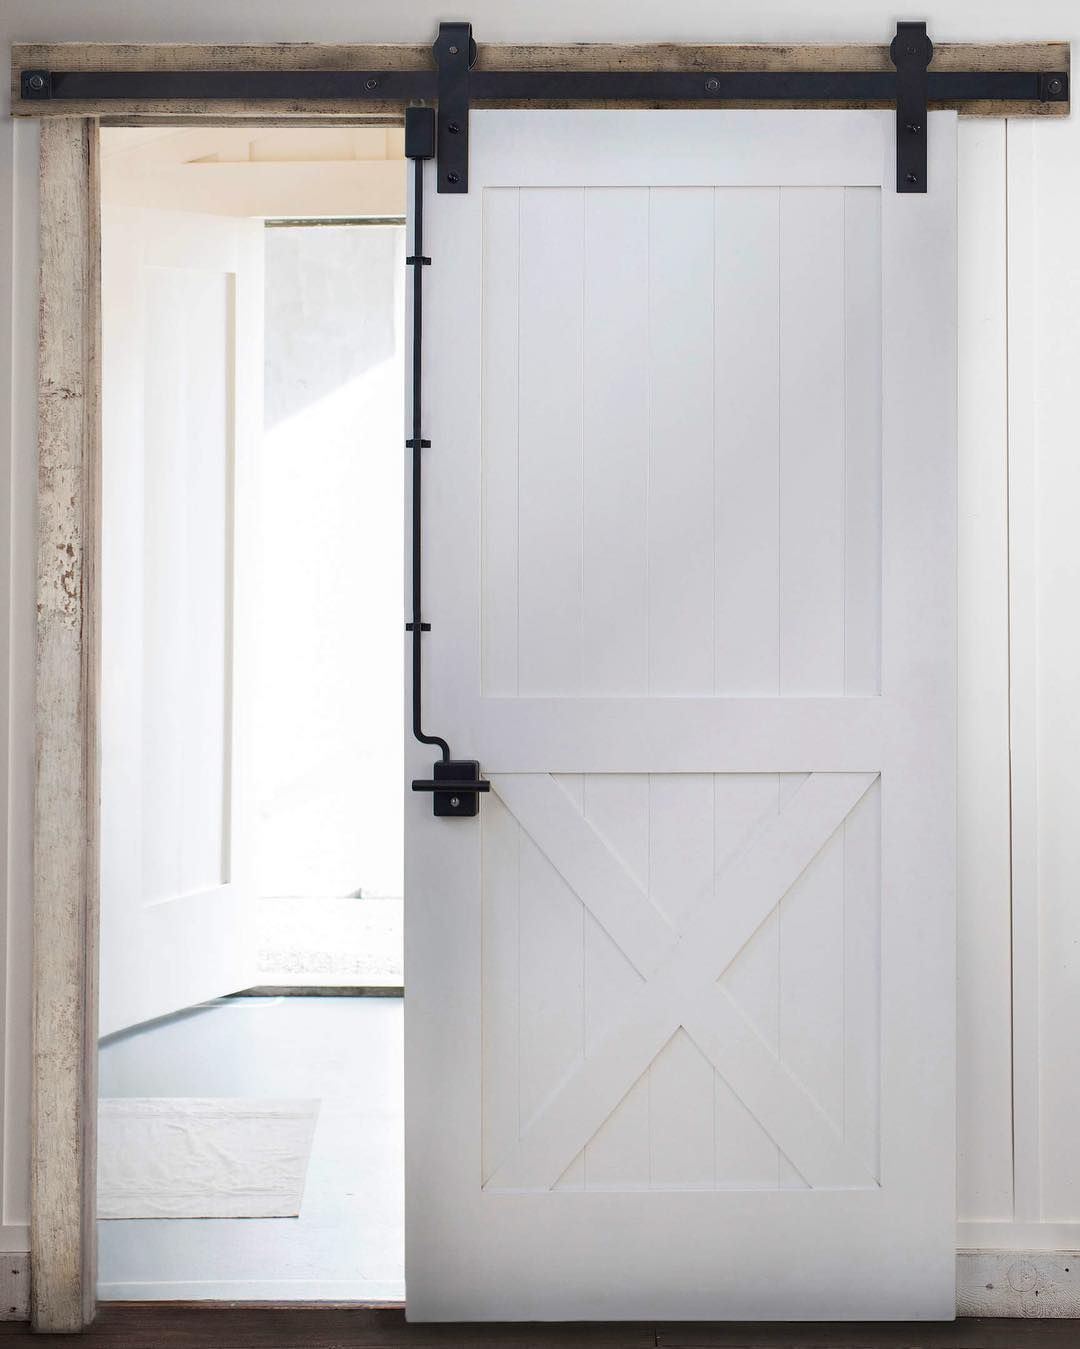 Introducing the Rustica Door Lock! We've pioneered the FIRST EVER ...